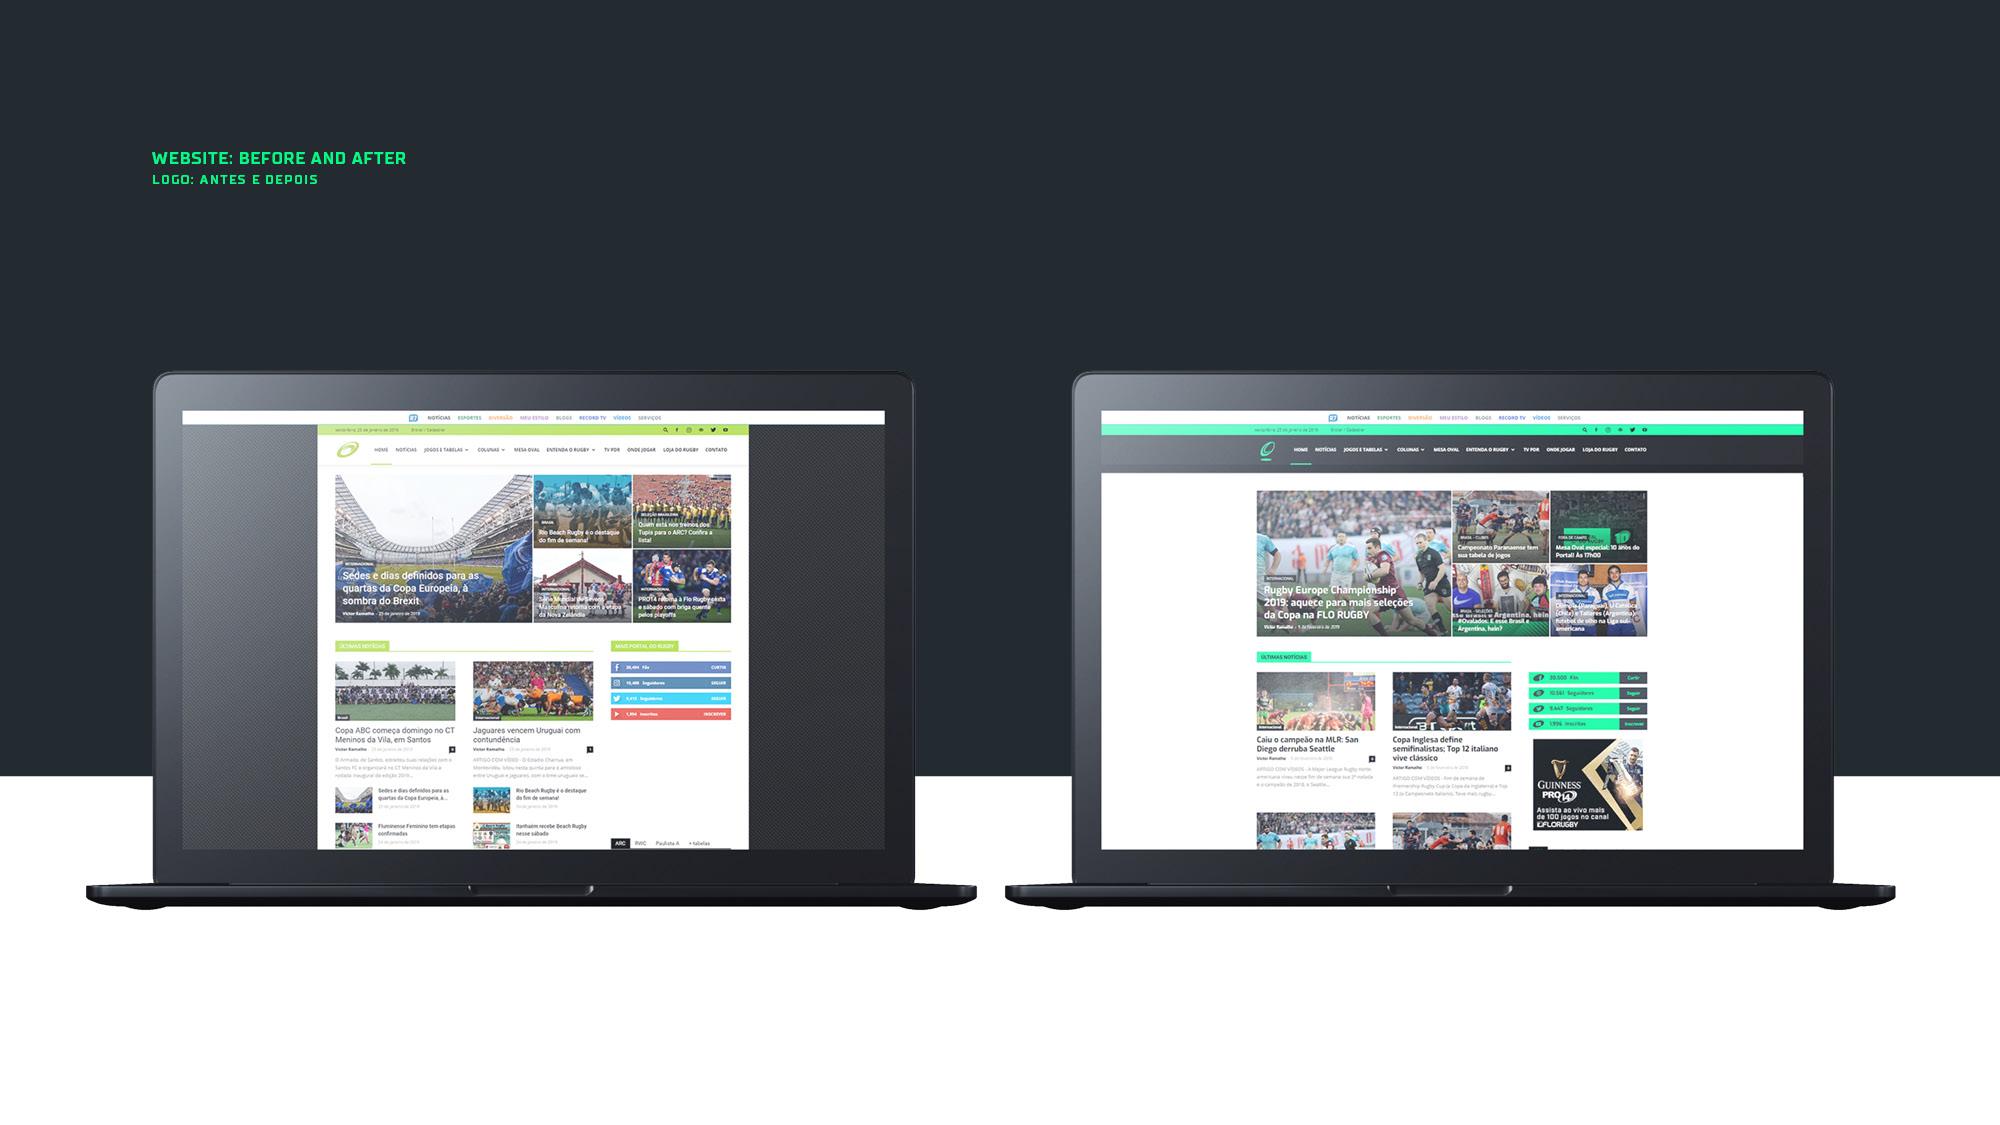 Nacione-Branding-Portal-do-Rugby17